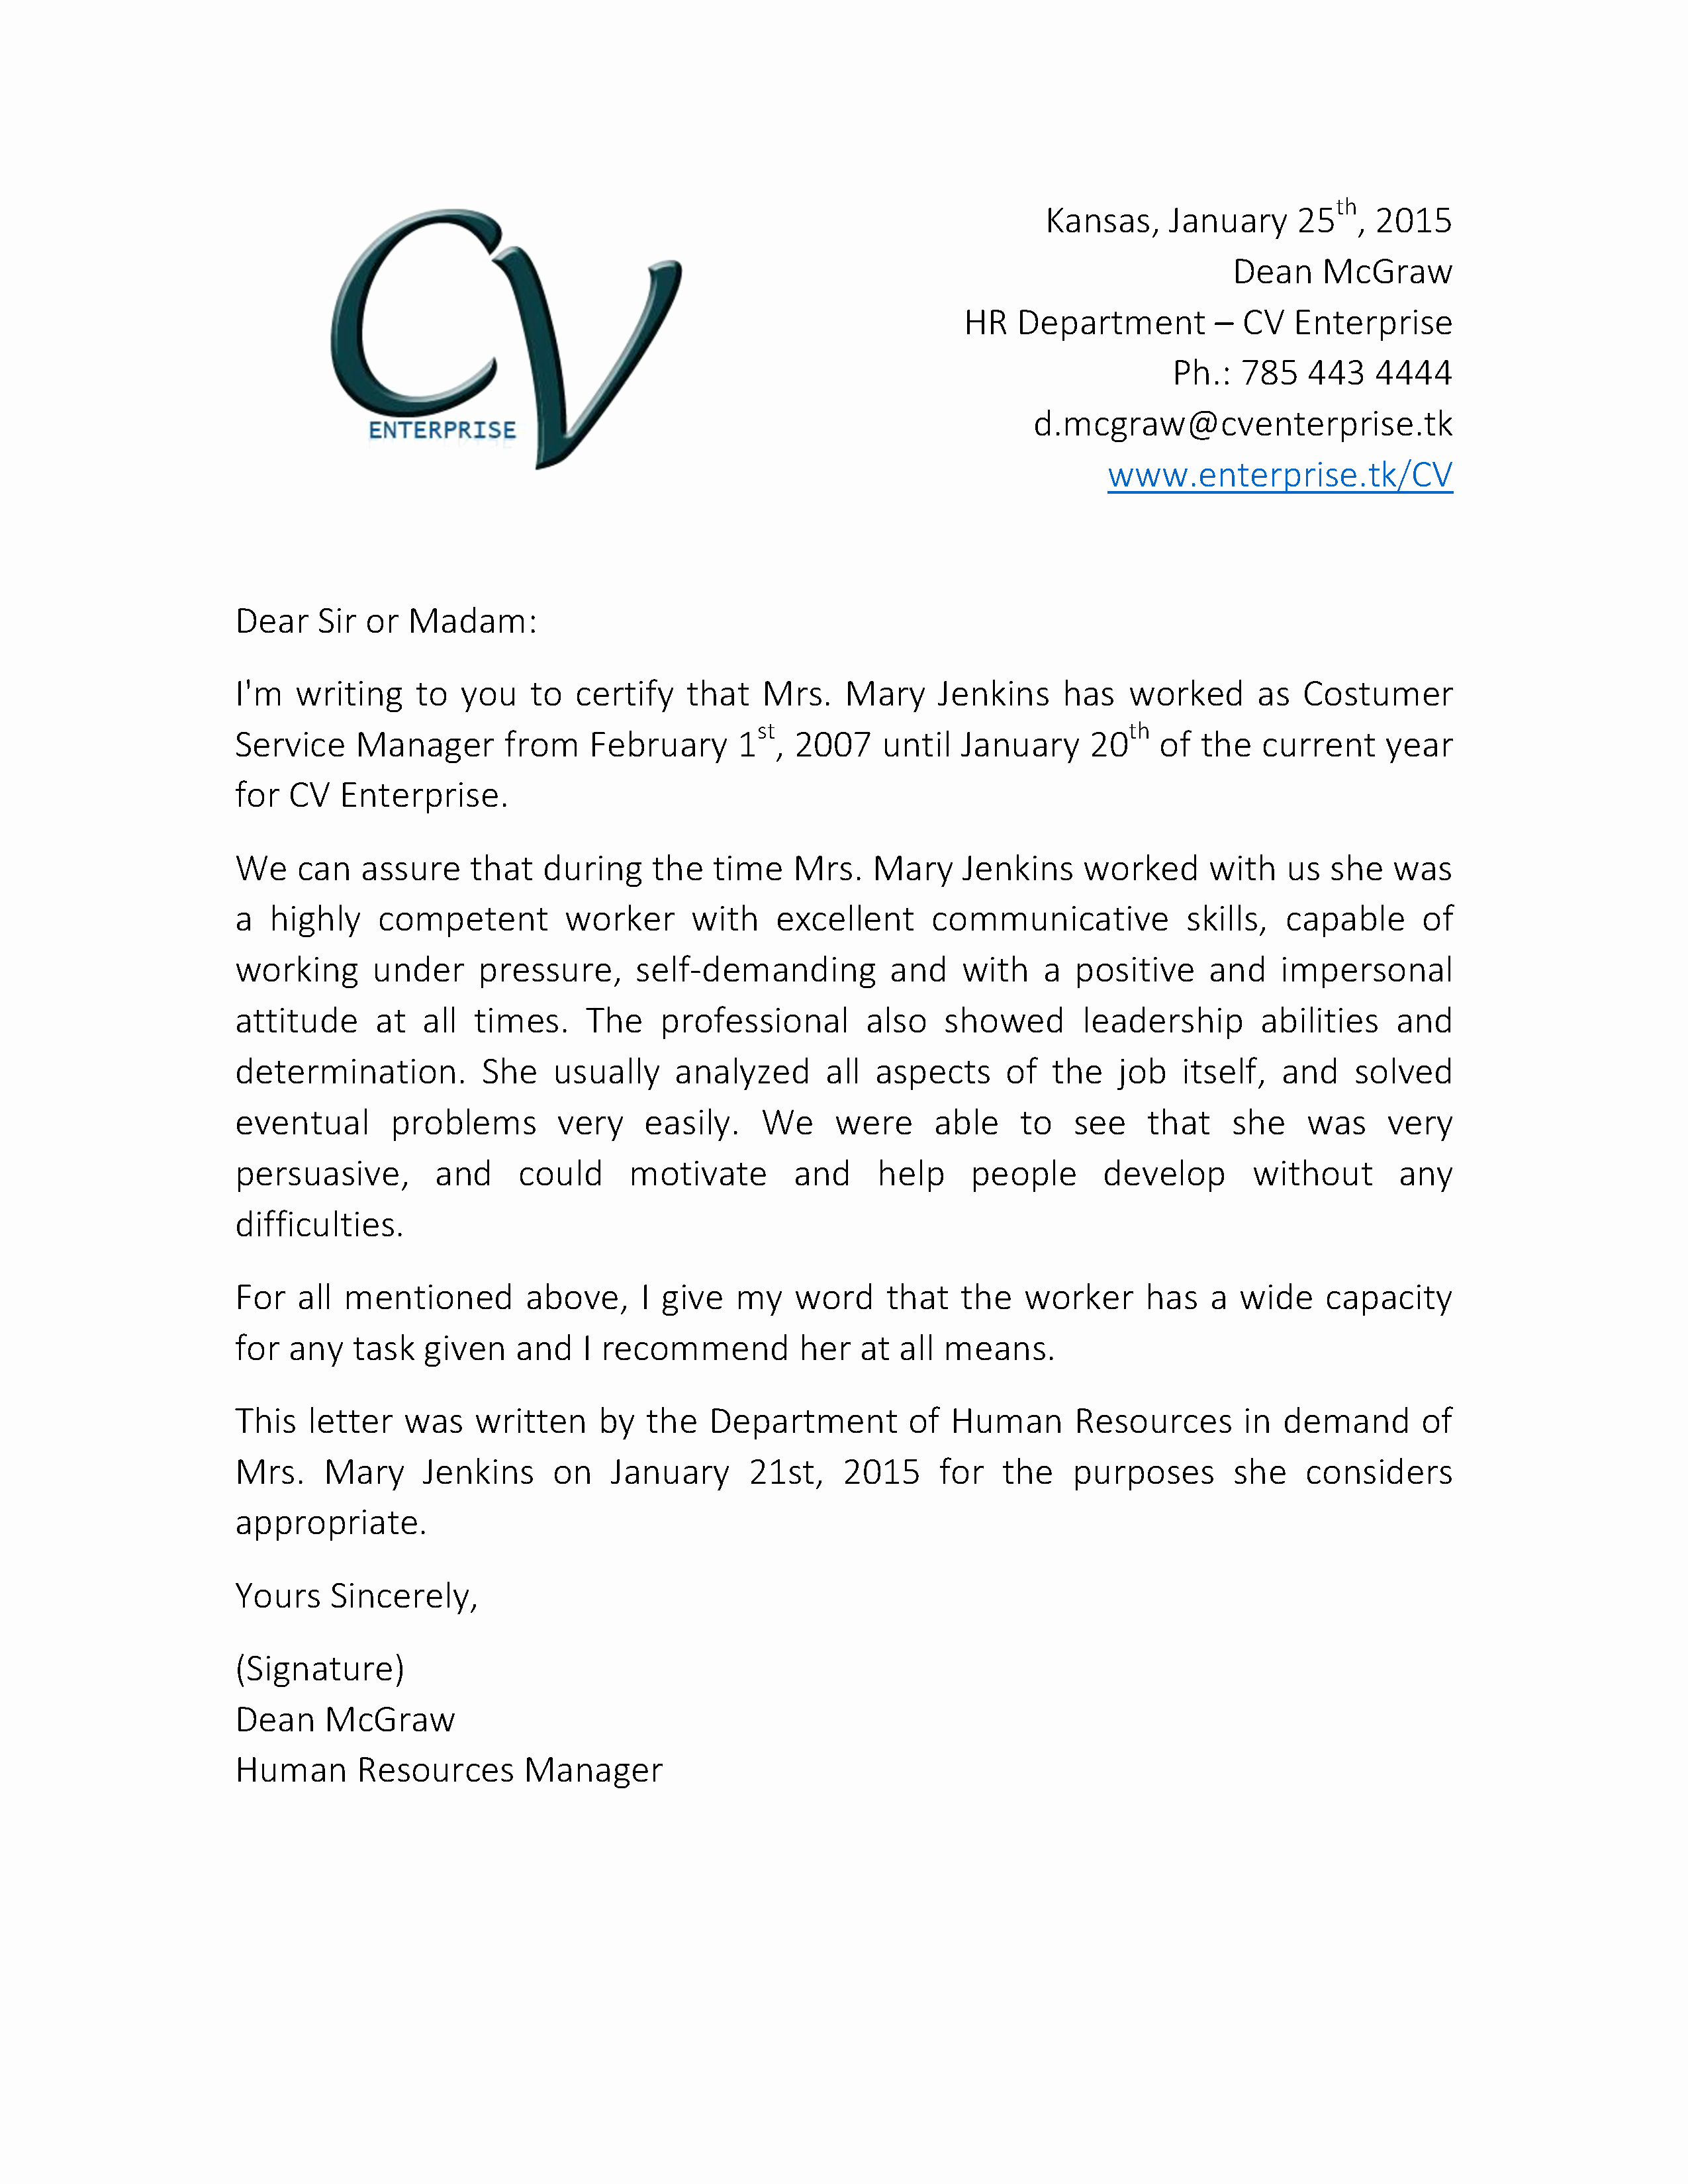 Letter Of Recommendation Template Free Unique Re Mendation Letter Service – Templates Free Printable